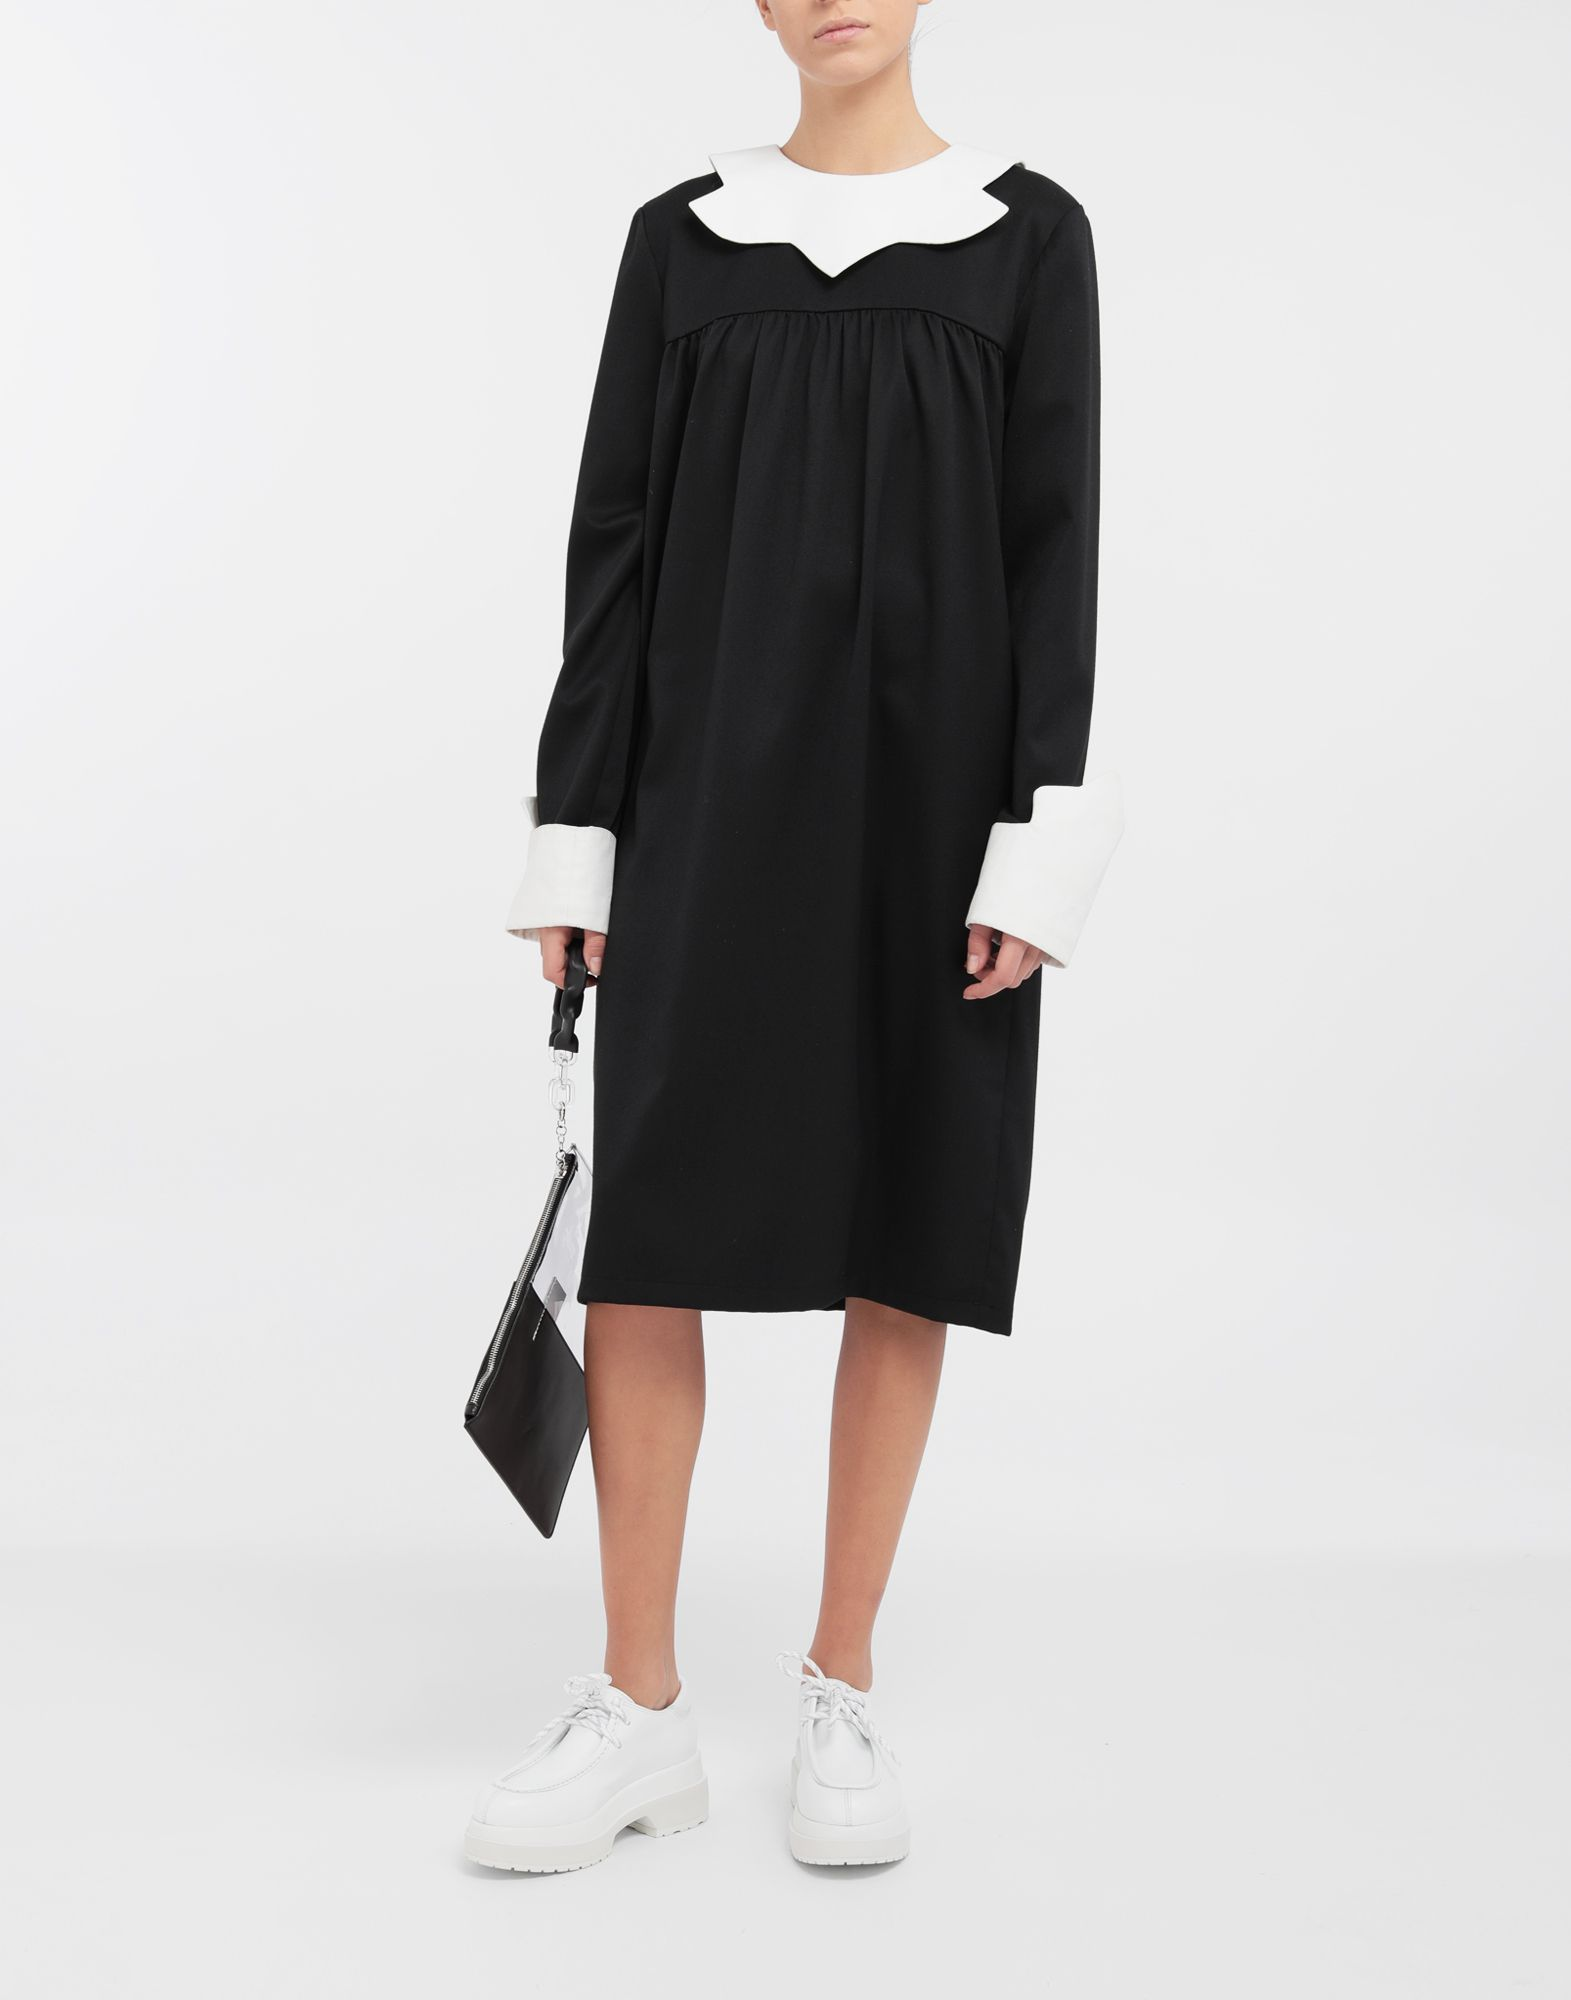 MM6 MAISON MARGIELA School uniform midi dress 3/4 length dress Woman d